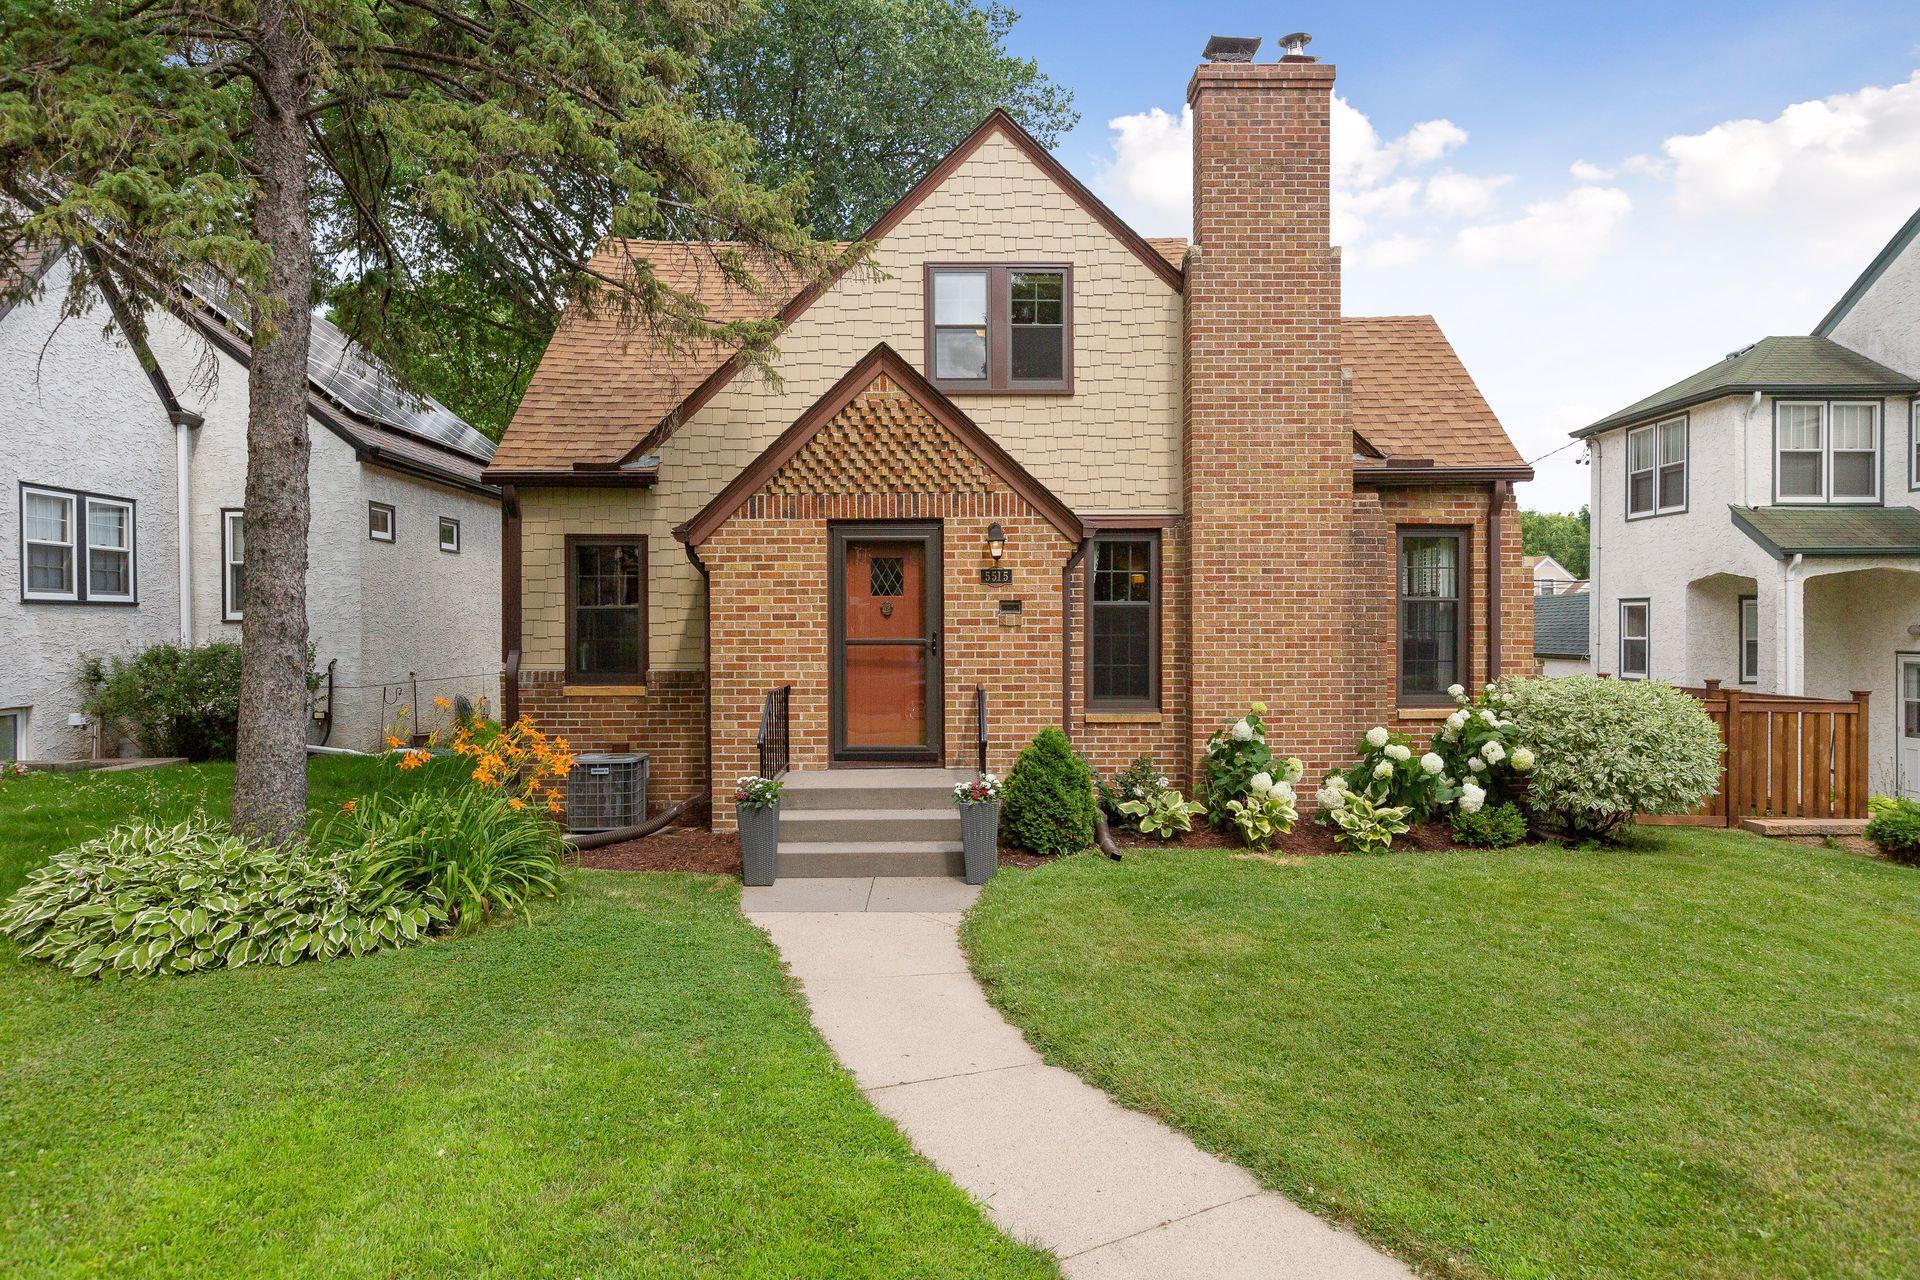 5515 10th S Property Photo - Minneapolis, MN real estate listing